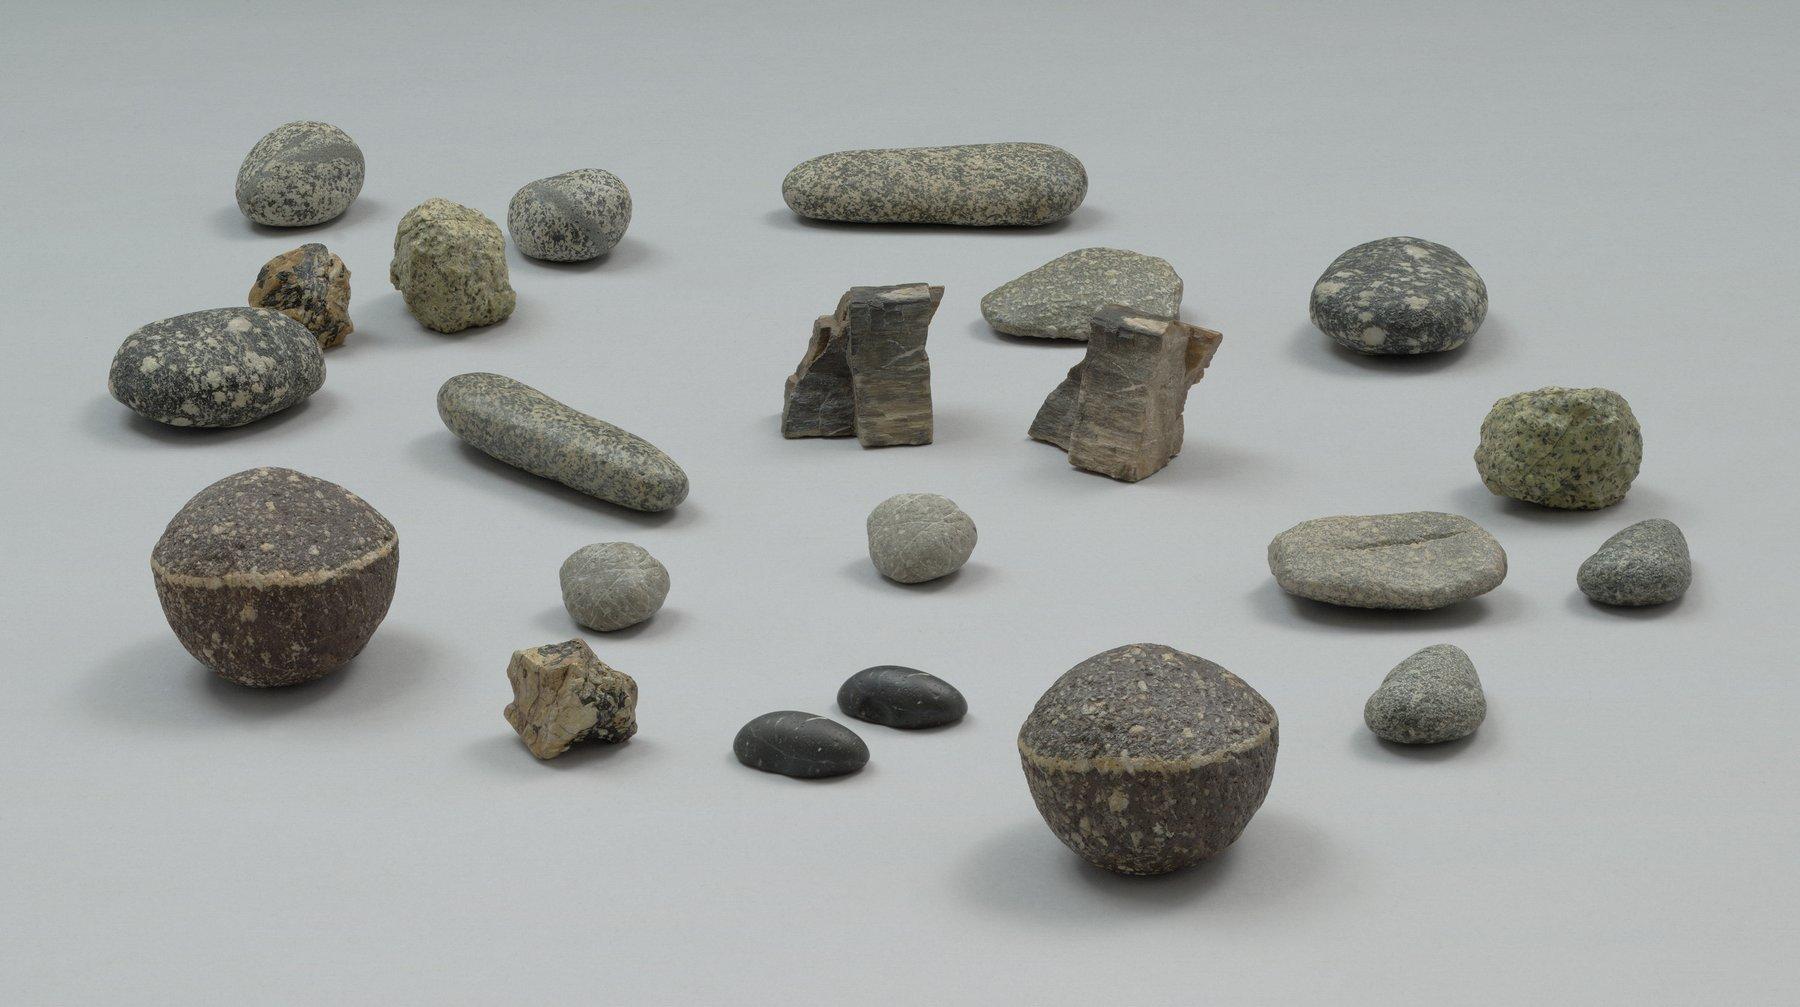 several stones on a flat plane, Vija Celmins